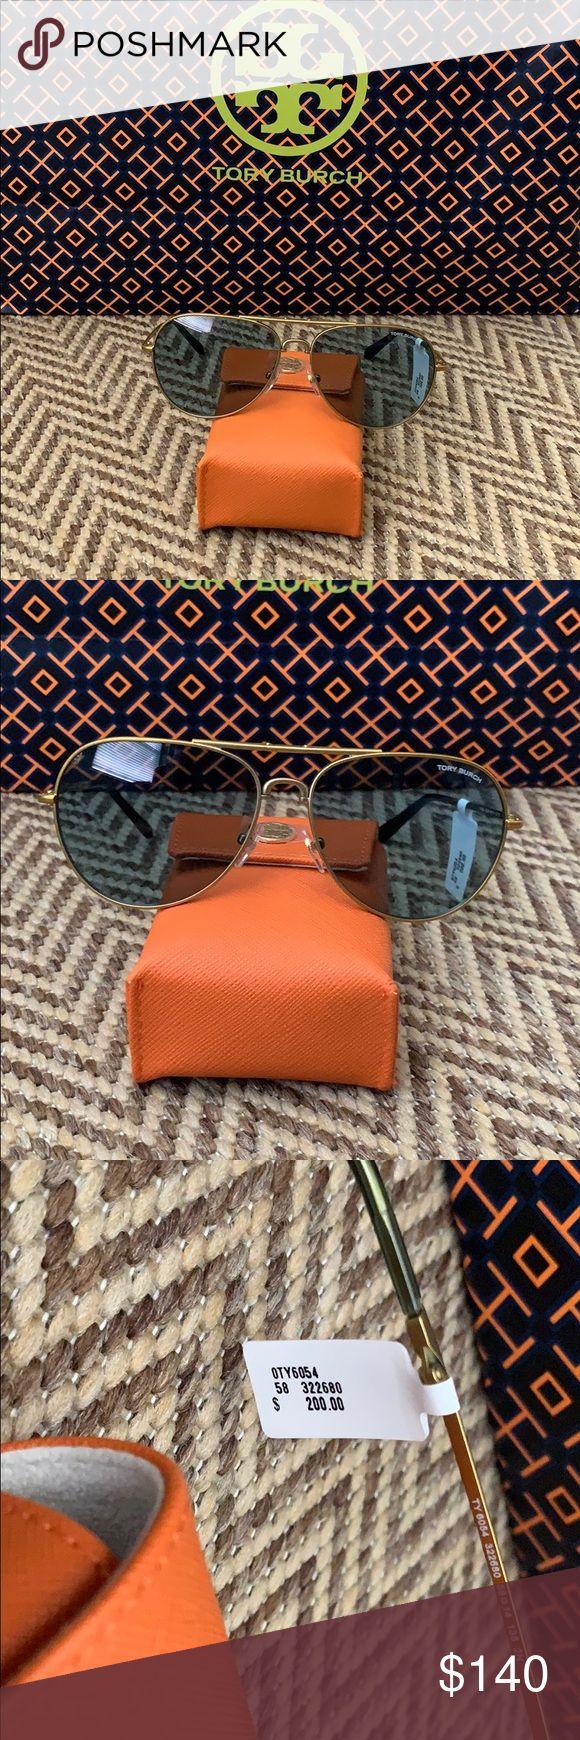 NWT Authentic Tory Burch Aviator Sunglasses NWT Authentic Tory Burch Aviator Sun…